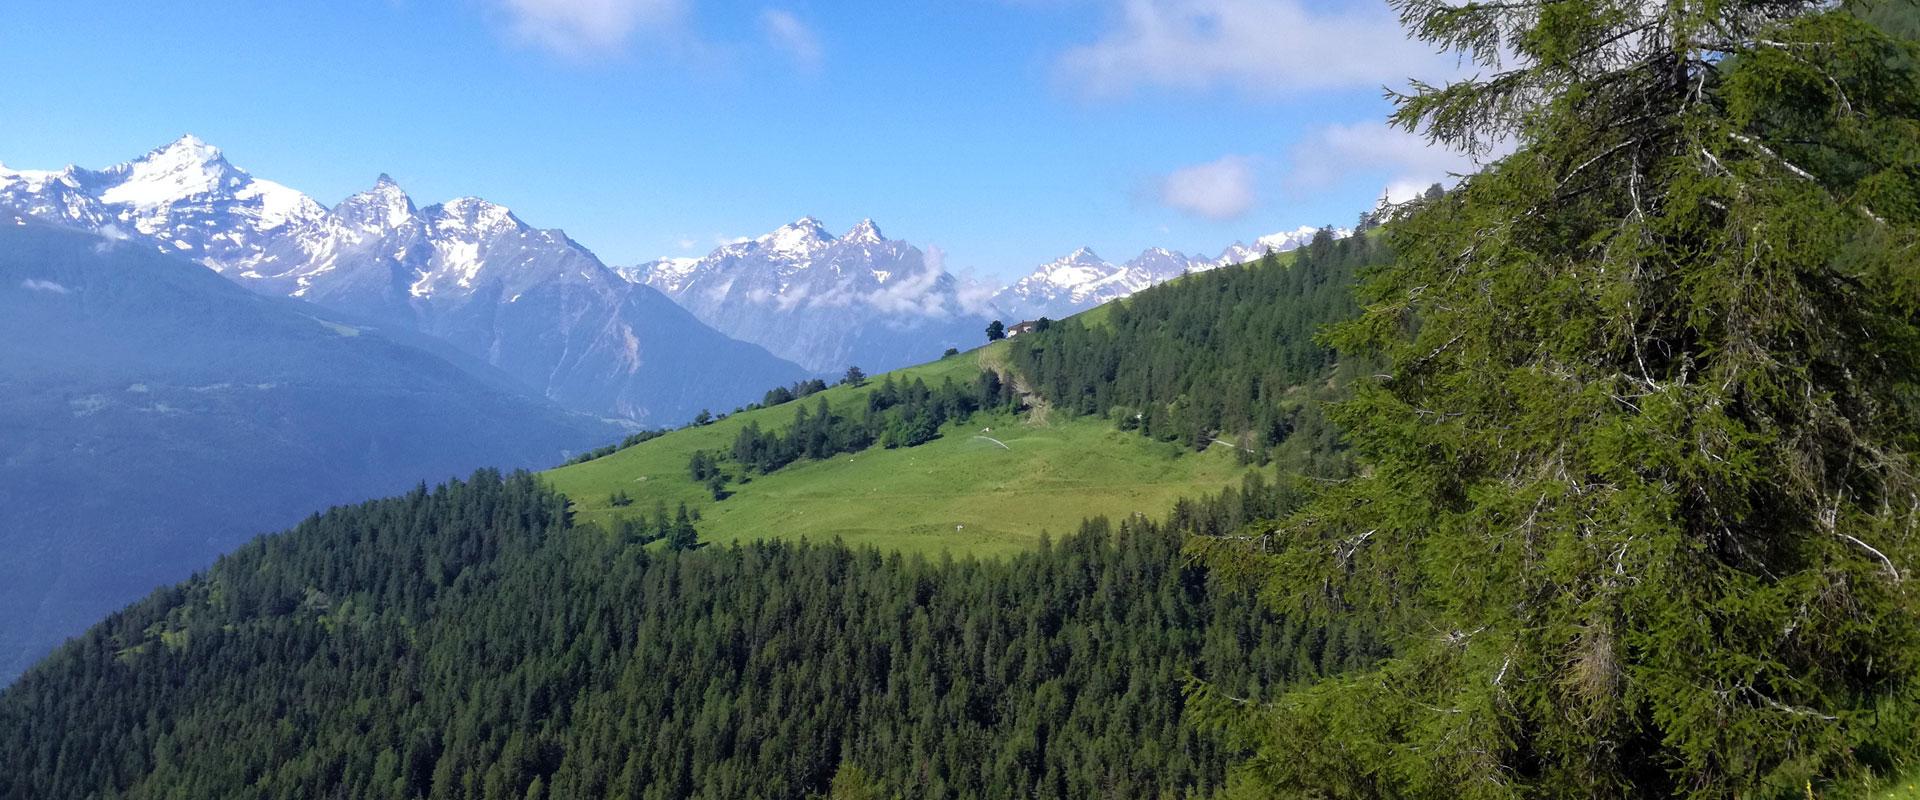 Alperne: Valle d'Aosta